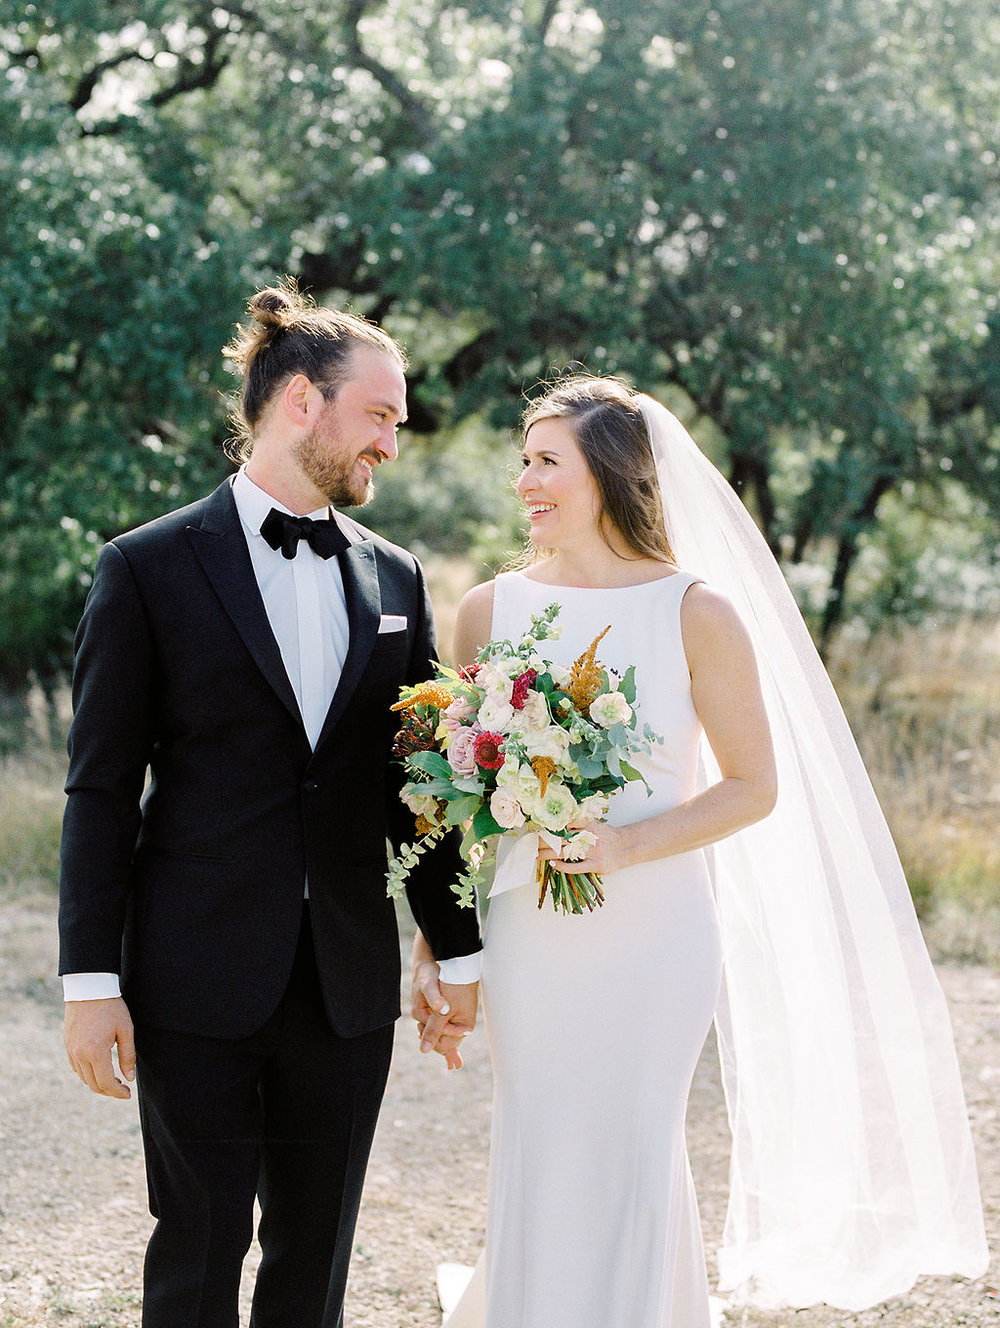 Austin-Texas-Wedding-Photographer-Addison-Grove-Film-53.jpg